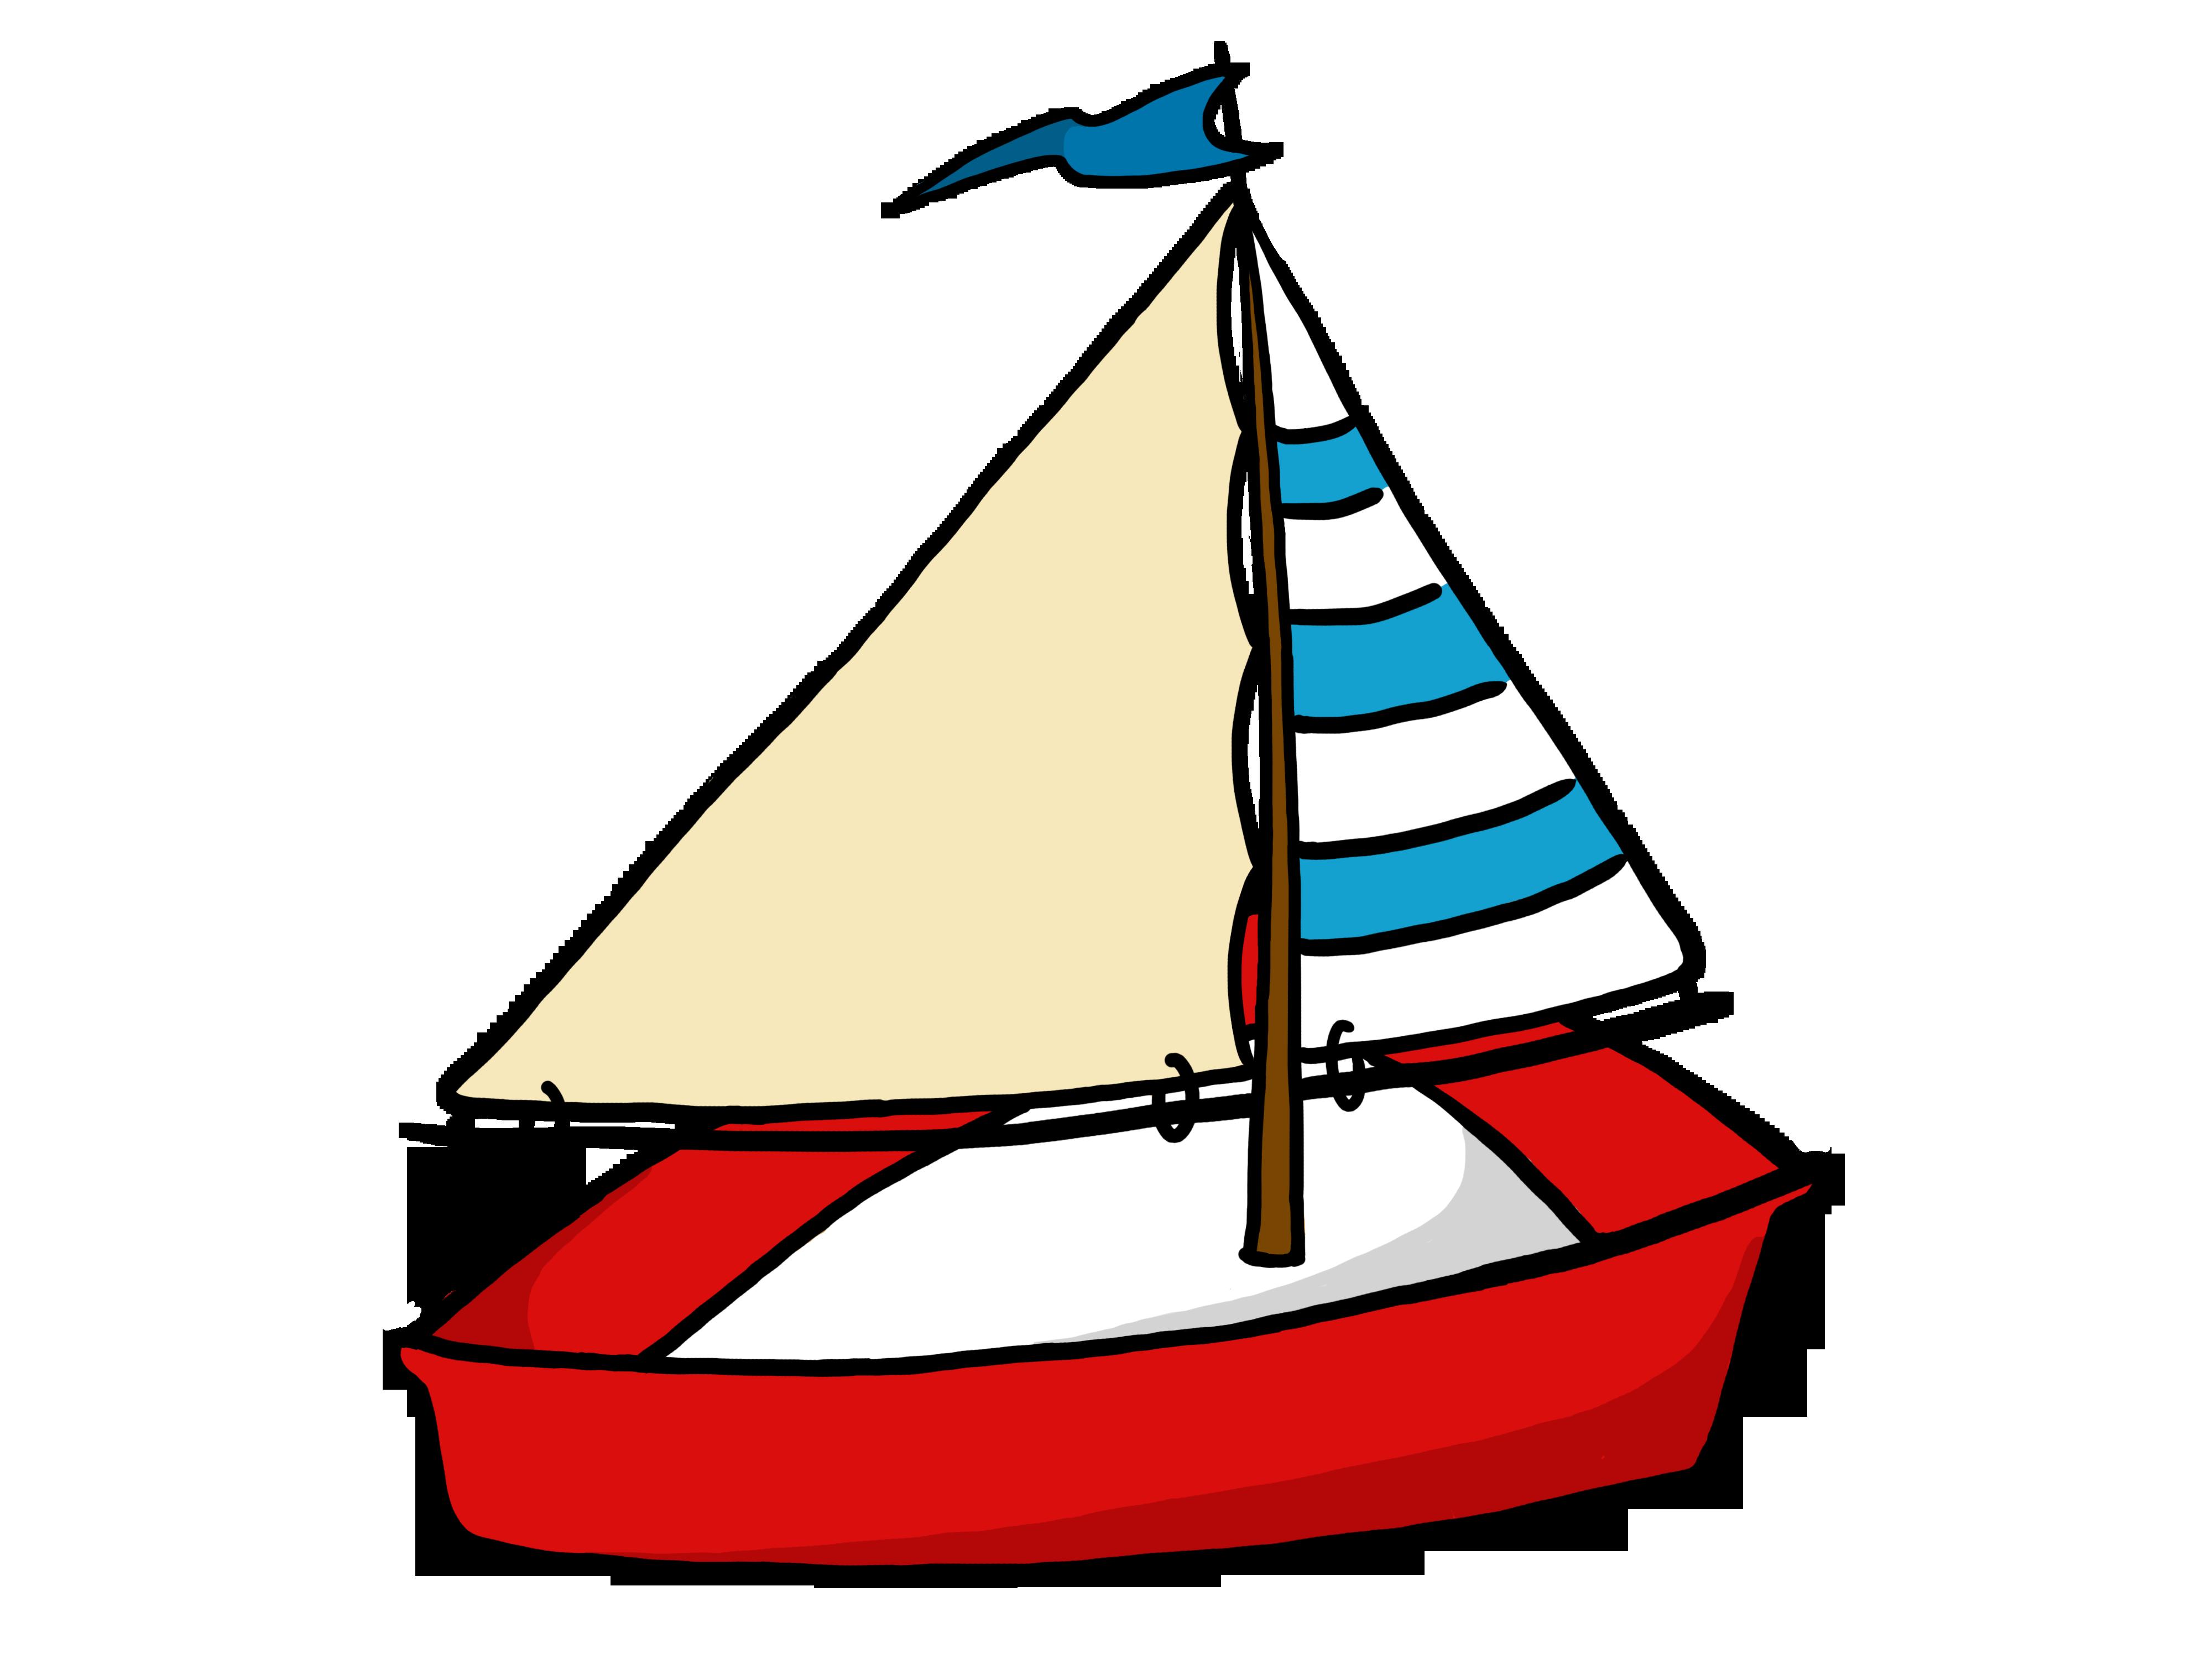 Pennant clipart boat flag, Pennant boat flag Transparent.